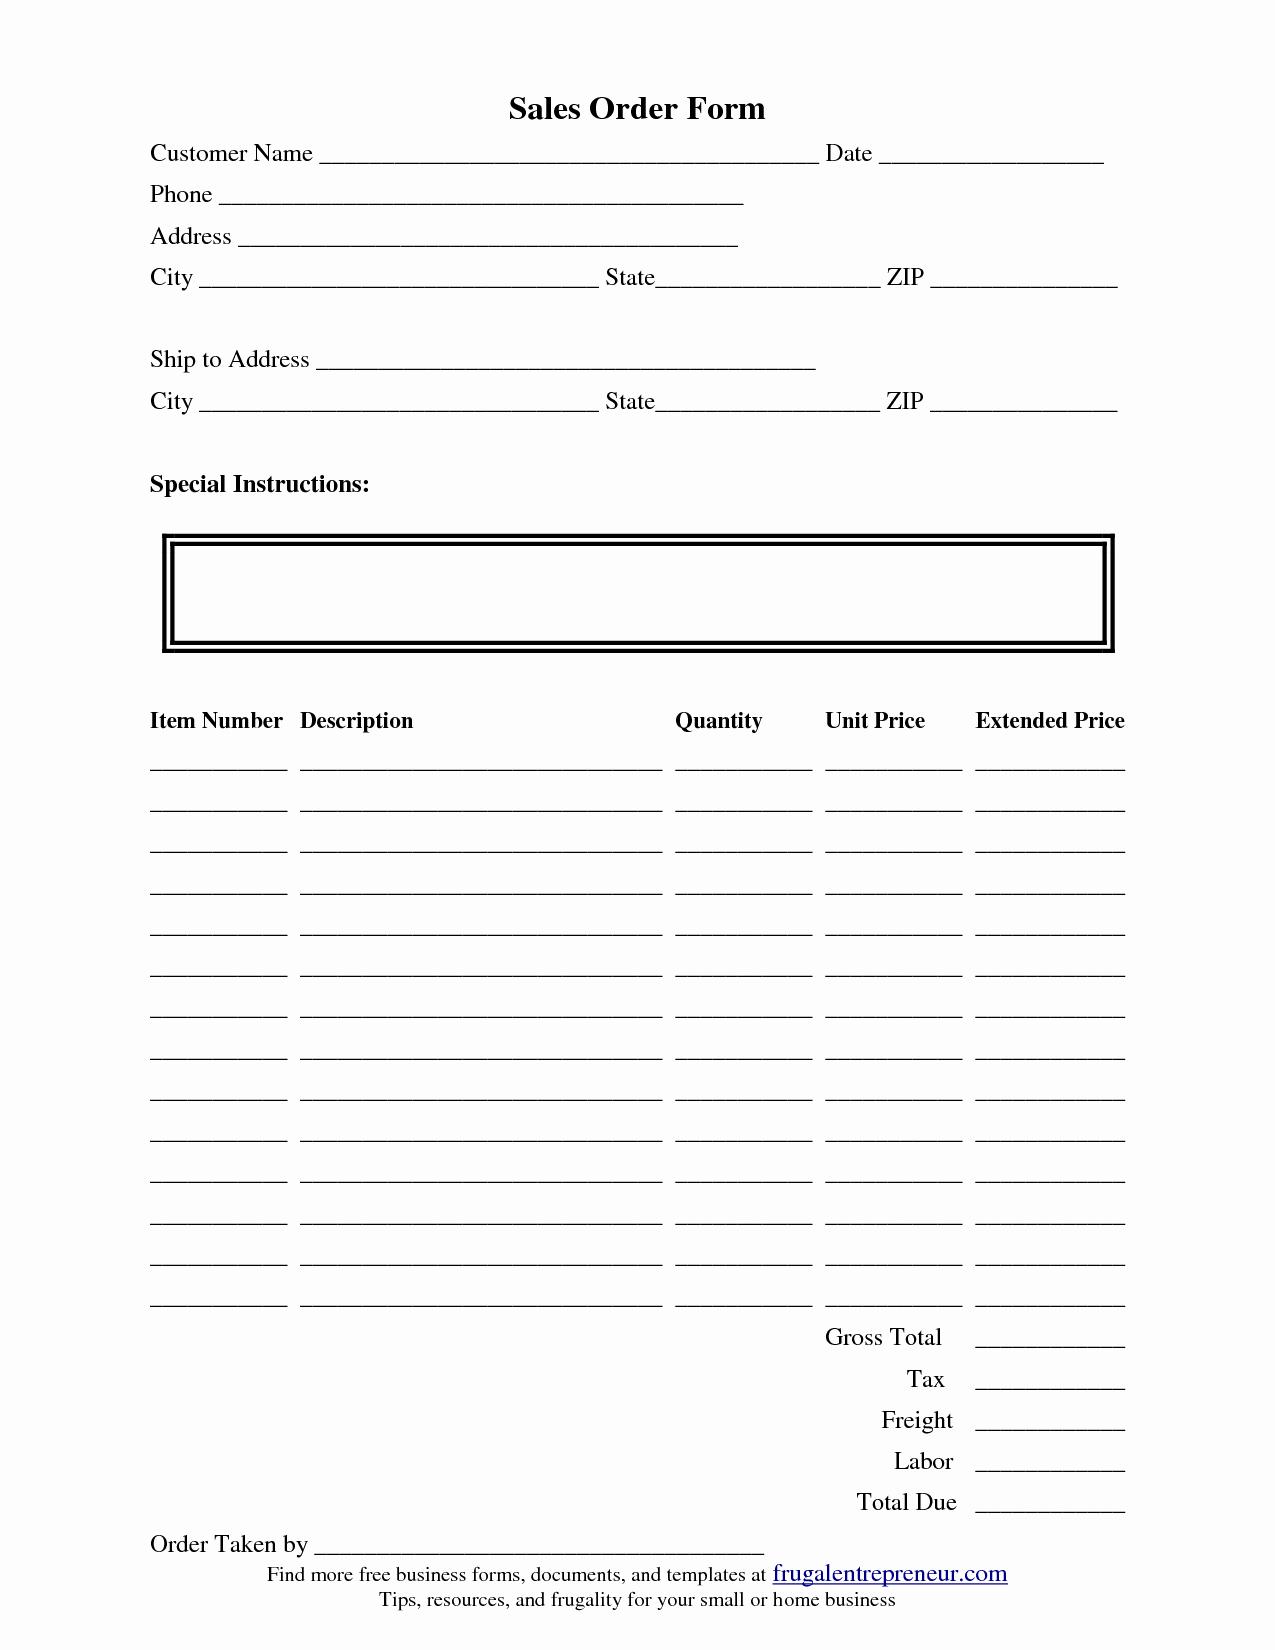 Sales order form Template Inspirational order form Template